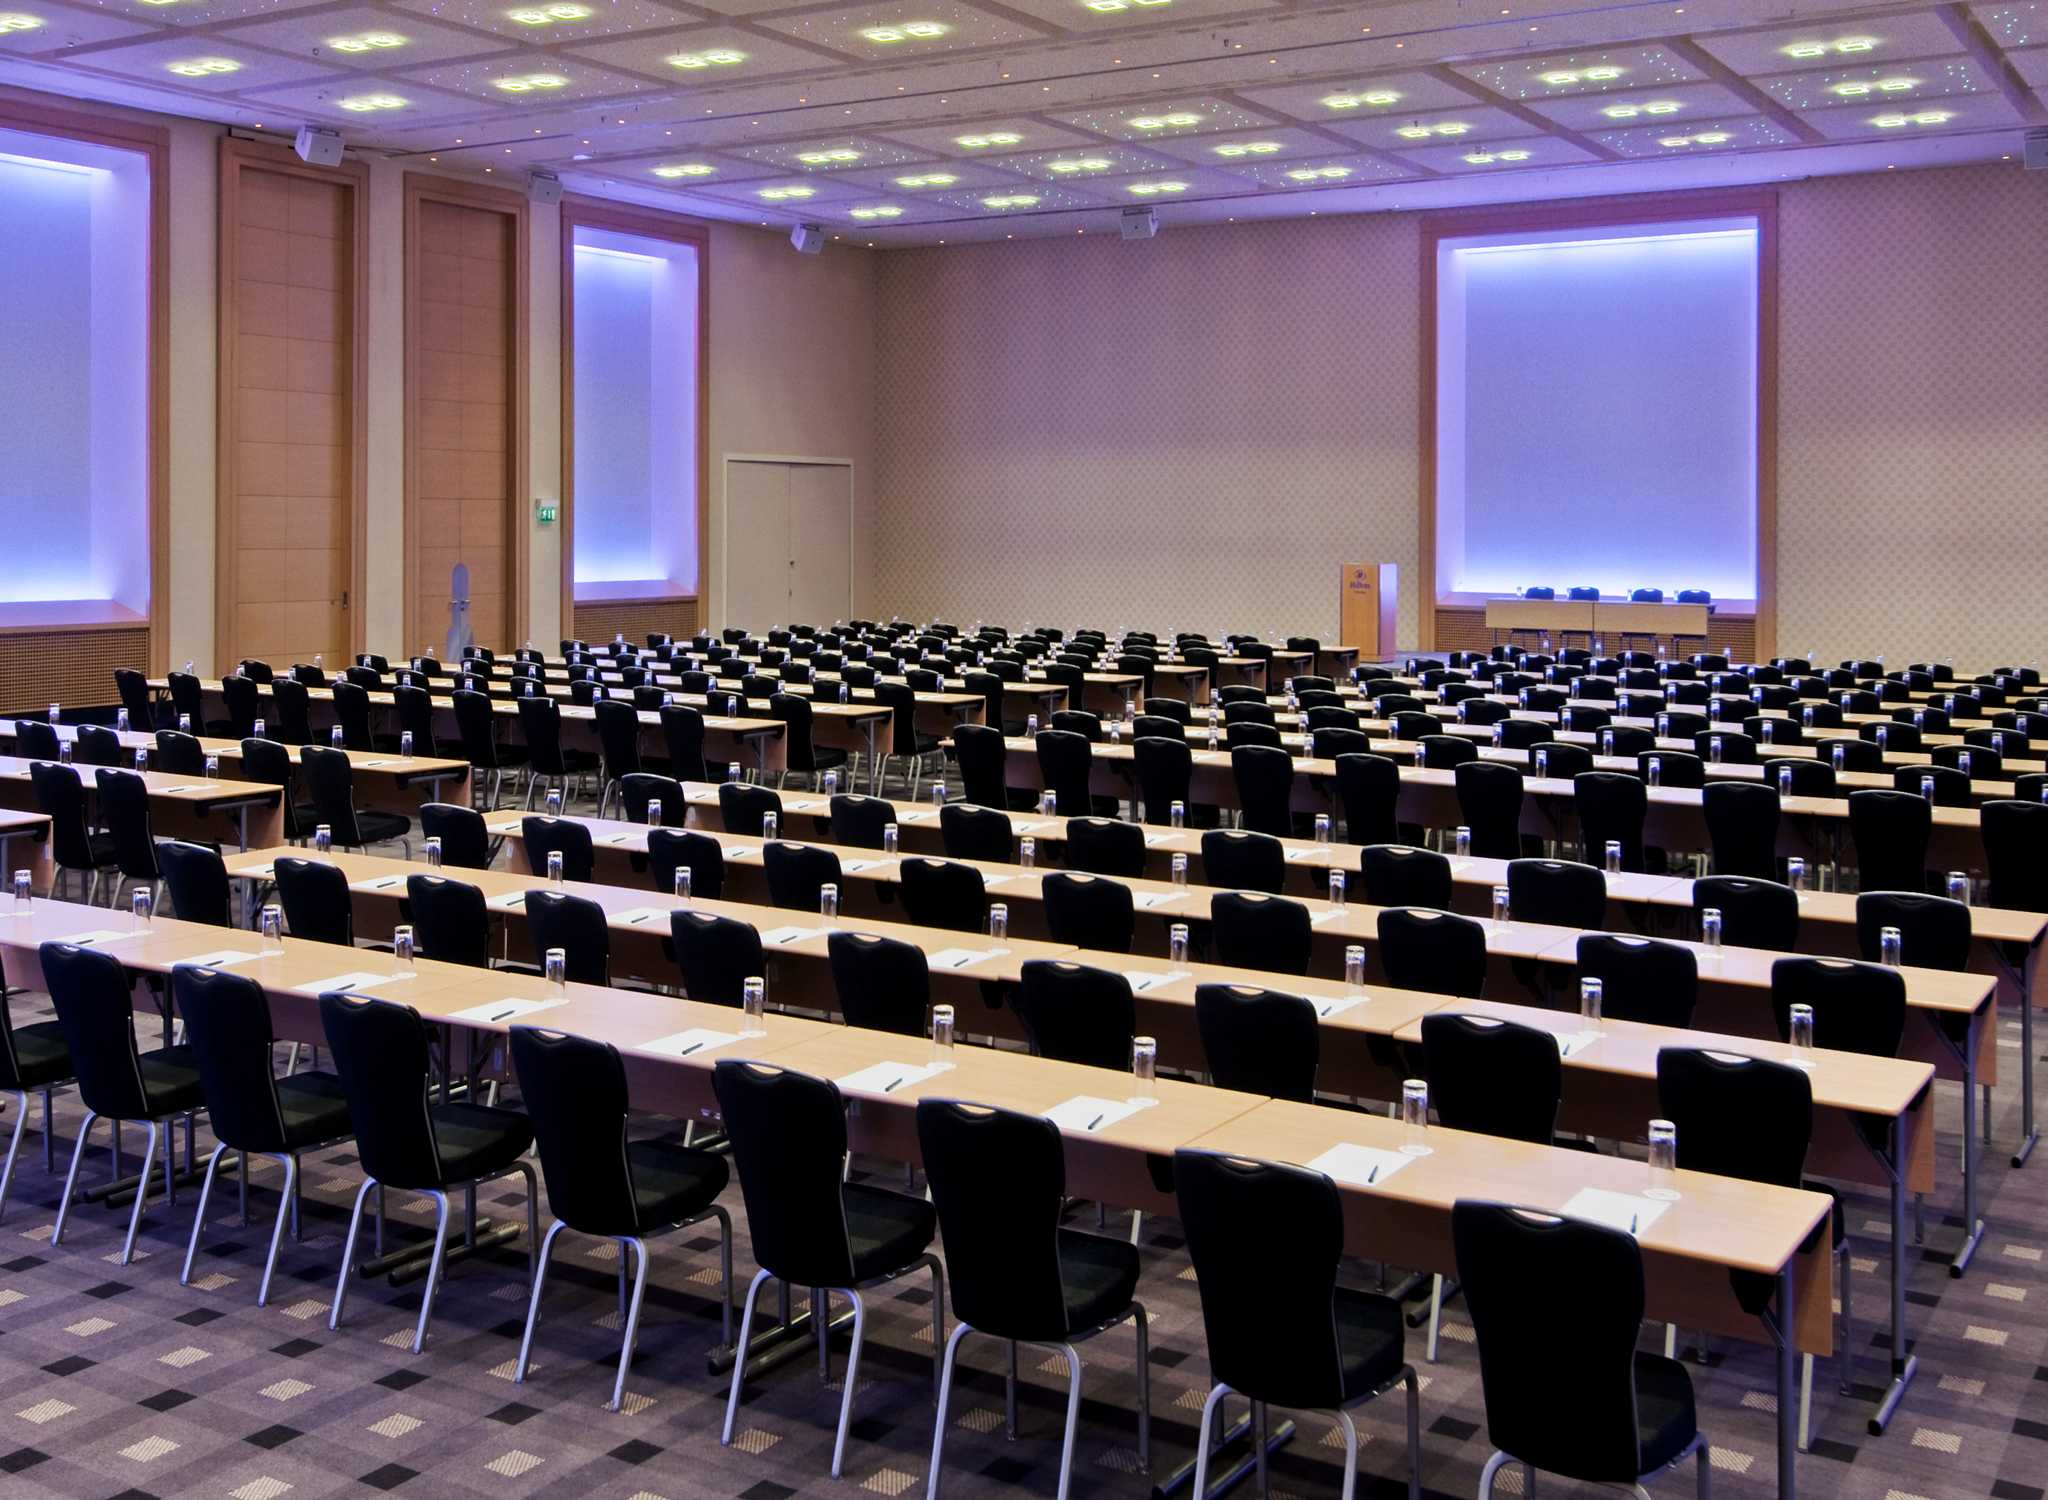 Meeting and event spaces at hilton austria hotels vienna and - H Tel Hilton Vienna Vienne Autriche Centre De Conf Rence